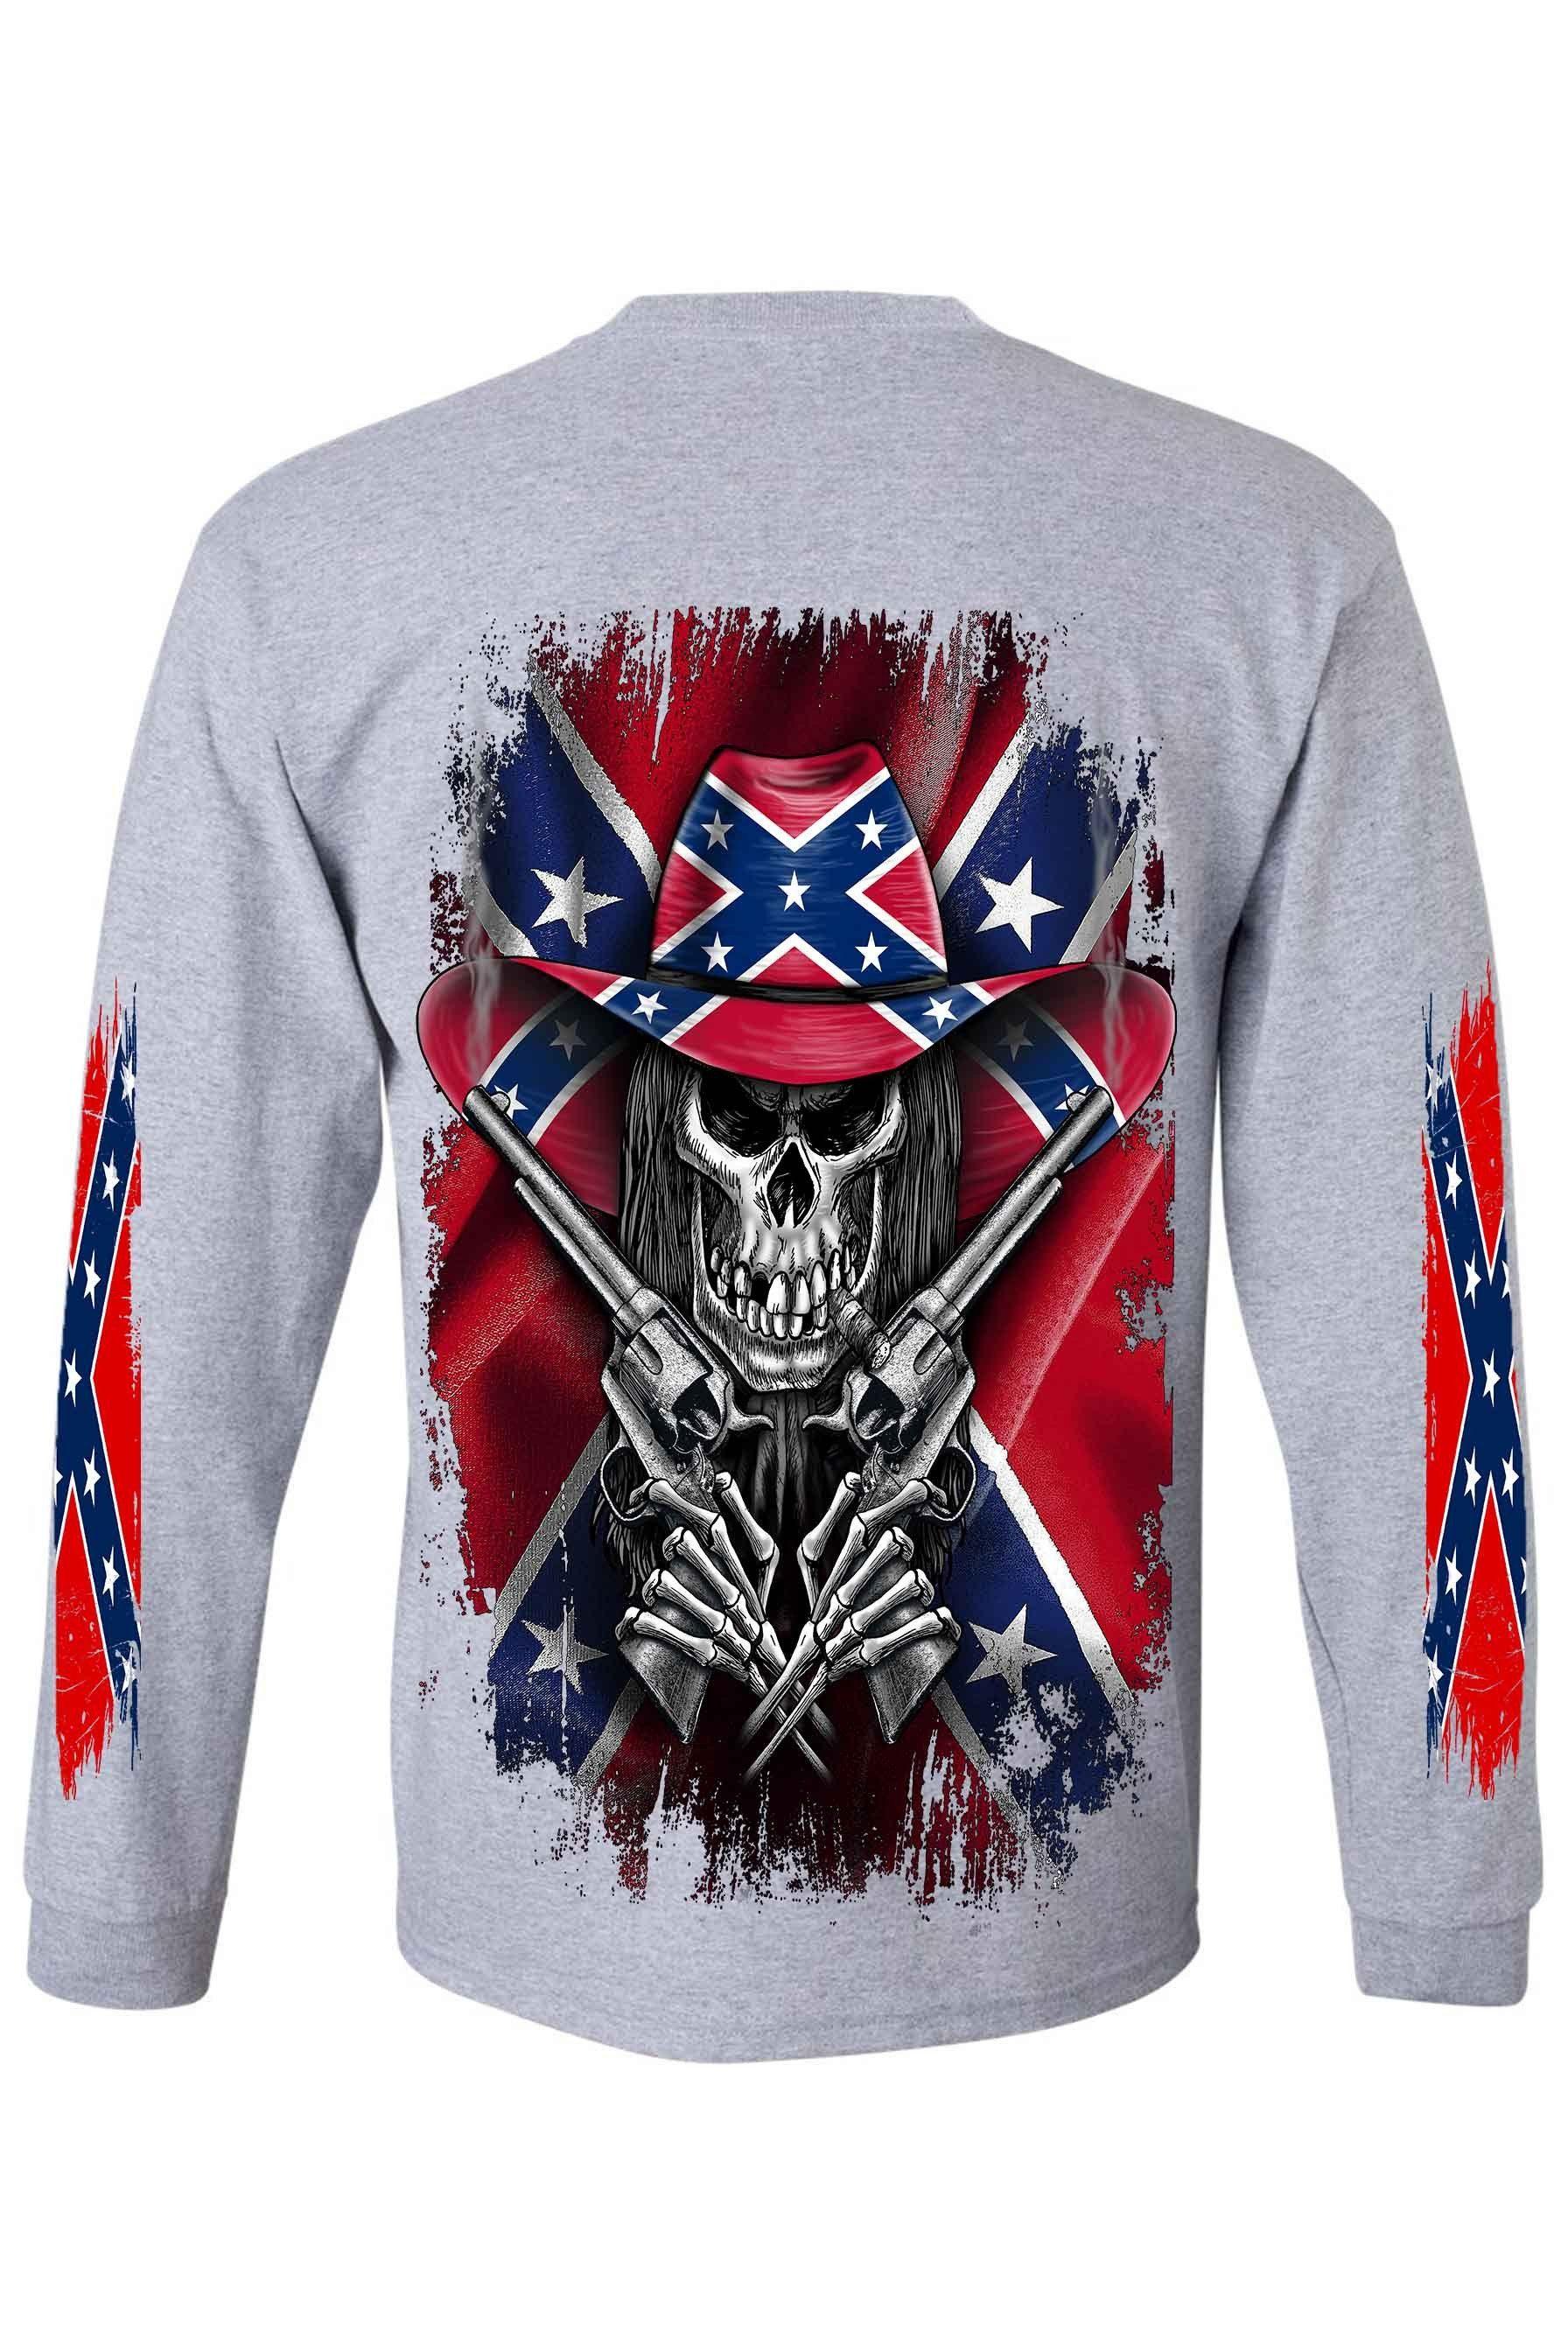 Pin On Rebel Flag Sleeveless And Long Sleeve